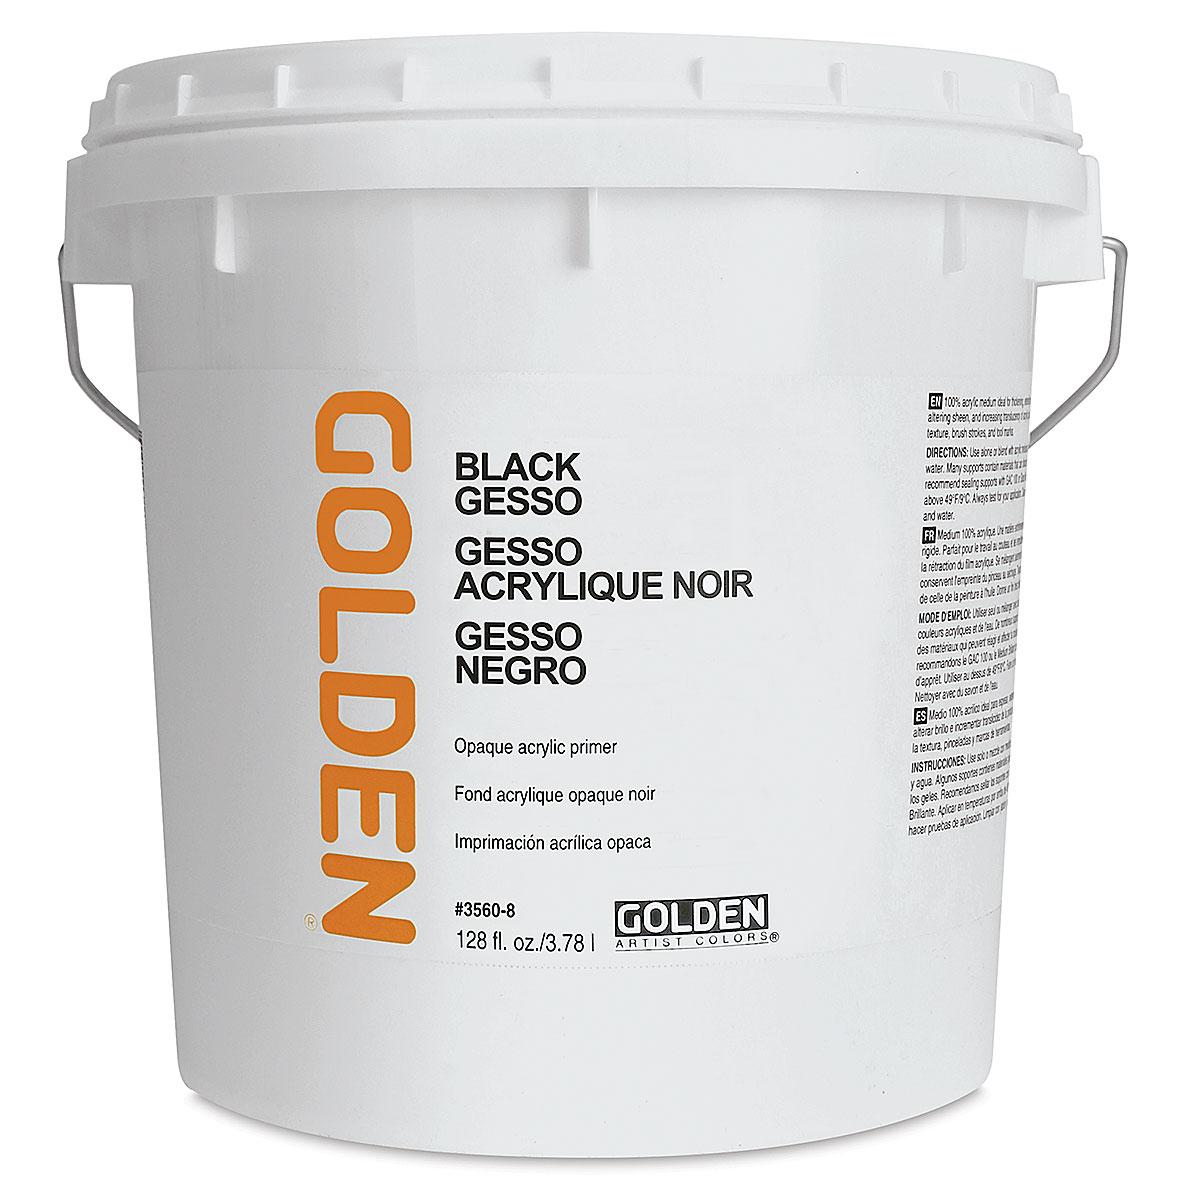 Golden Gesso - Black, 128 oz tub